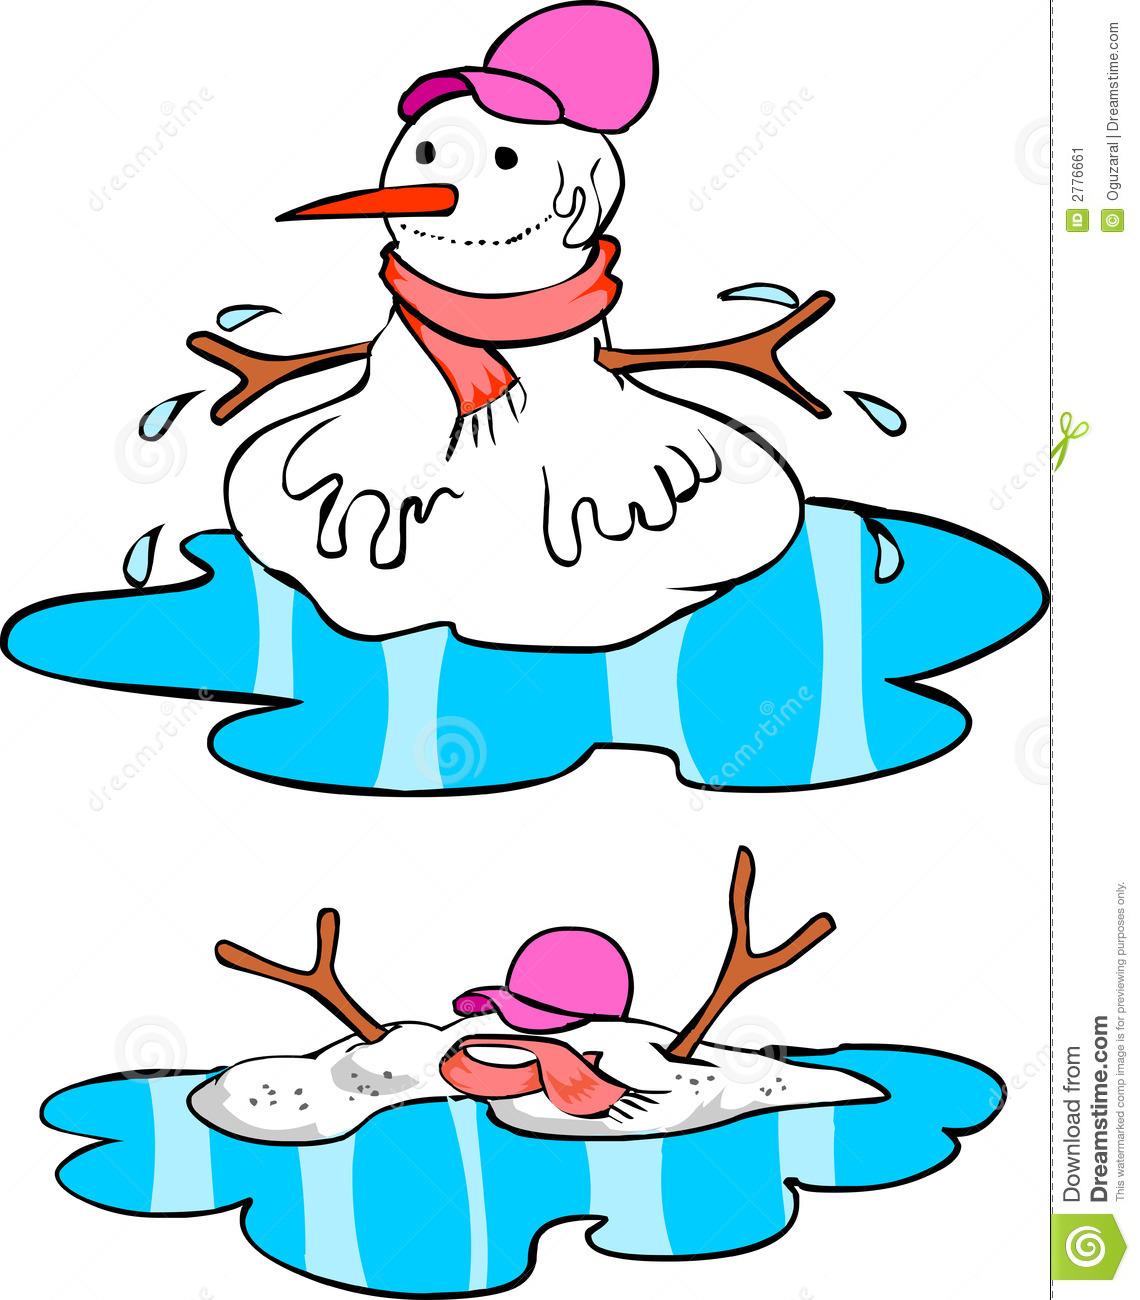 1140x1300 Melting Snowman Clipart 101 Clip Art